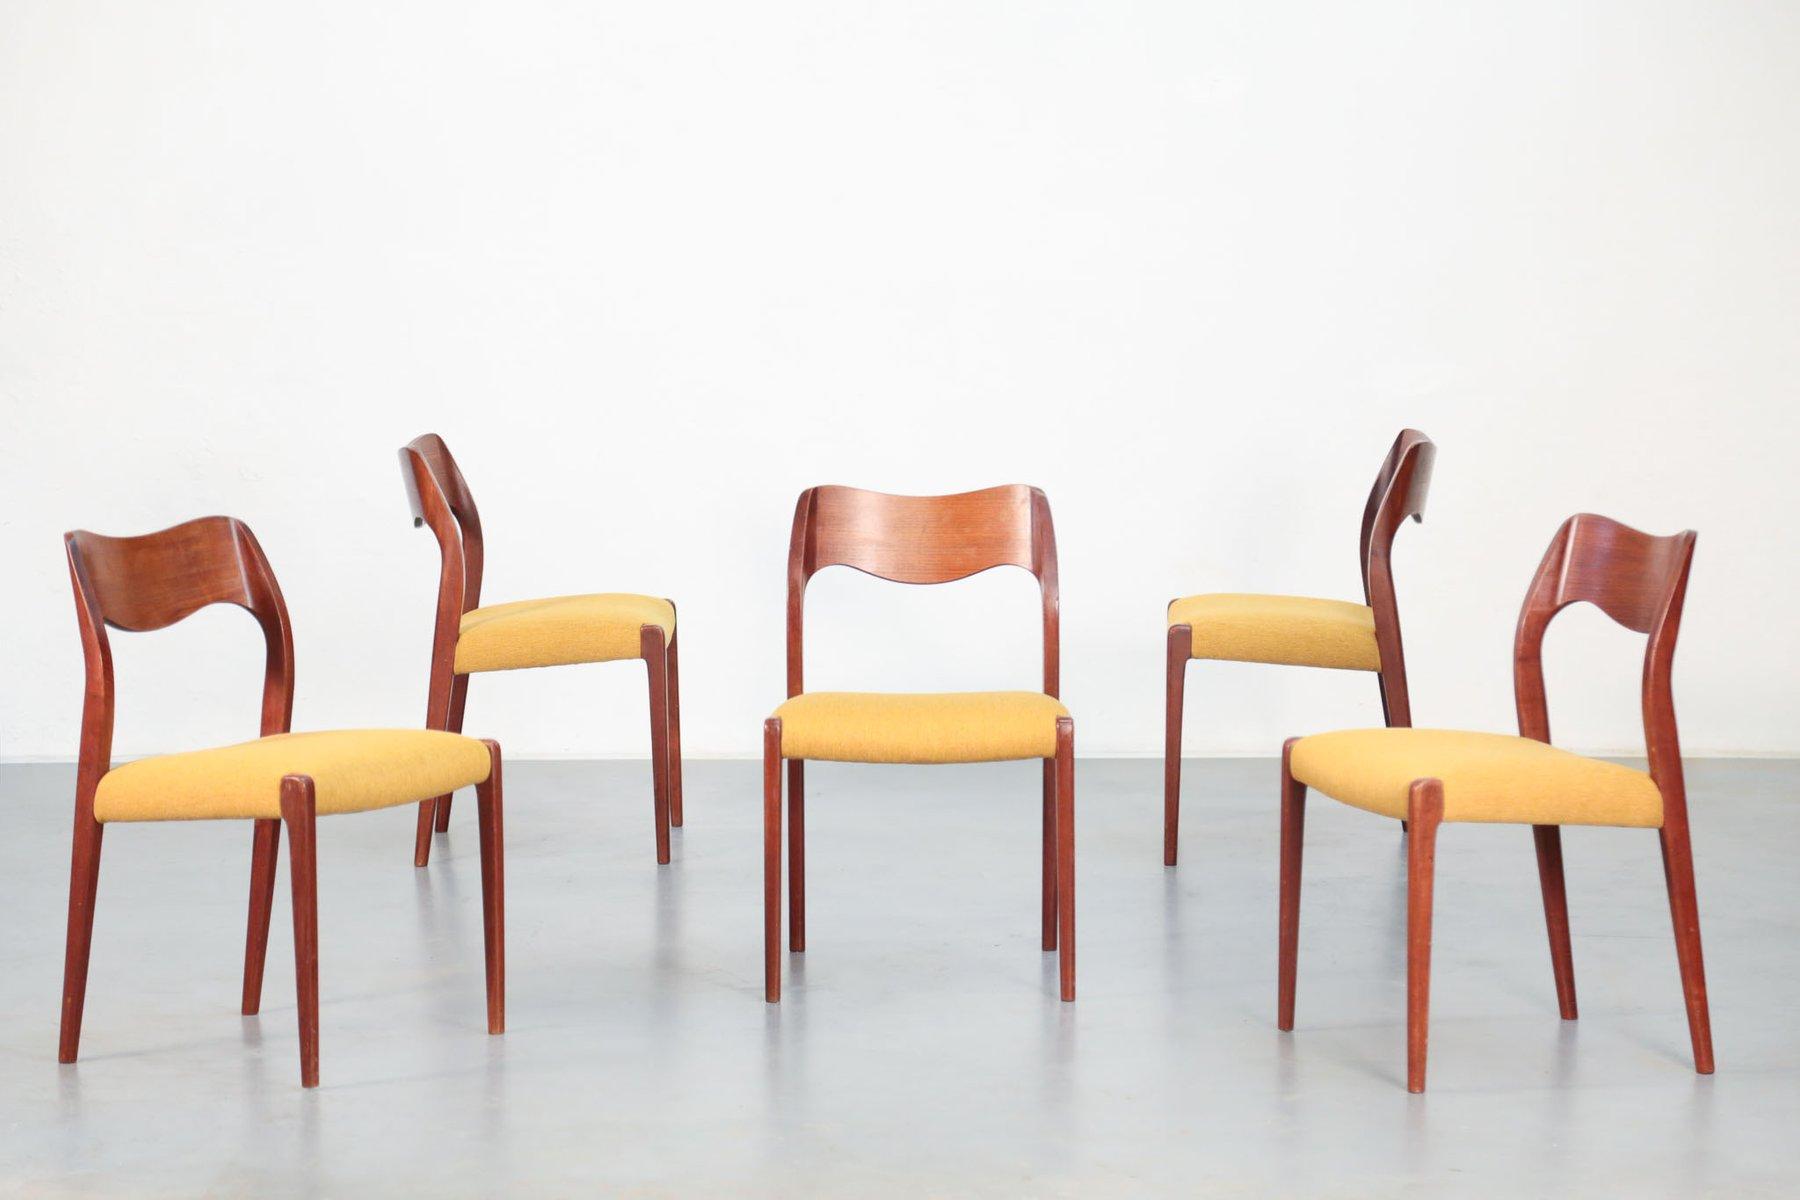 skandinavische st hle von niels otto m ller f r j l. Black Bedroom Furniture Sets. Home Design Ideas